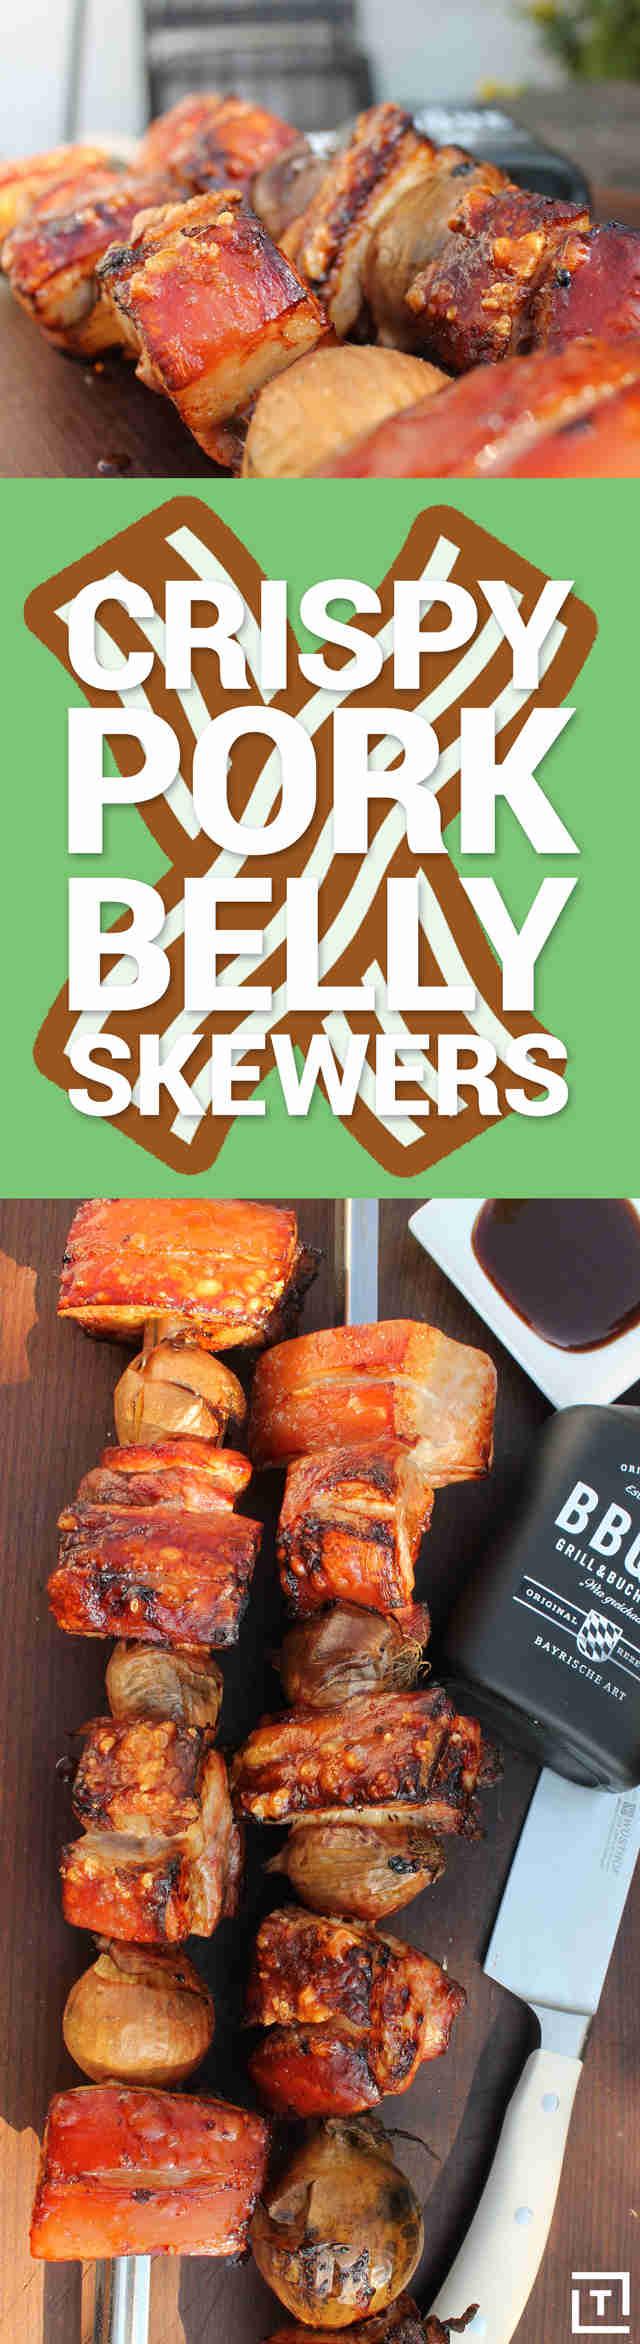 Crispy Pork Belly Skewers Recipe Video Thrillist